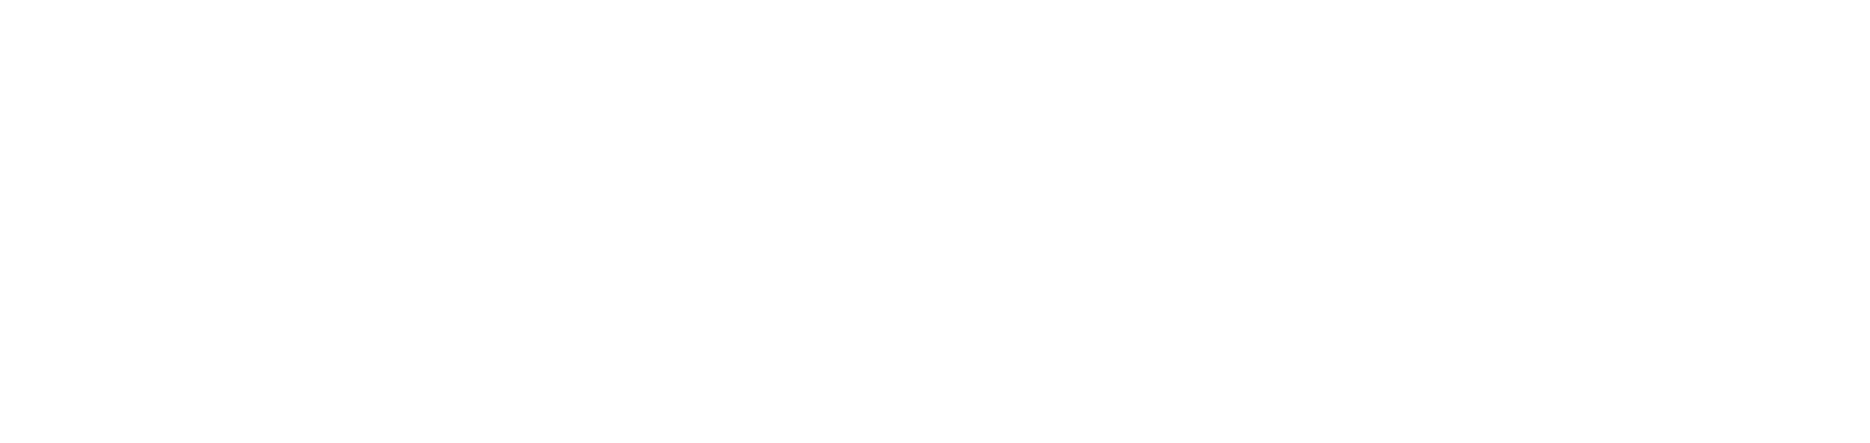 split-notes